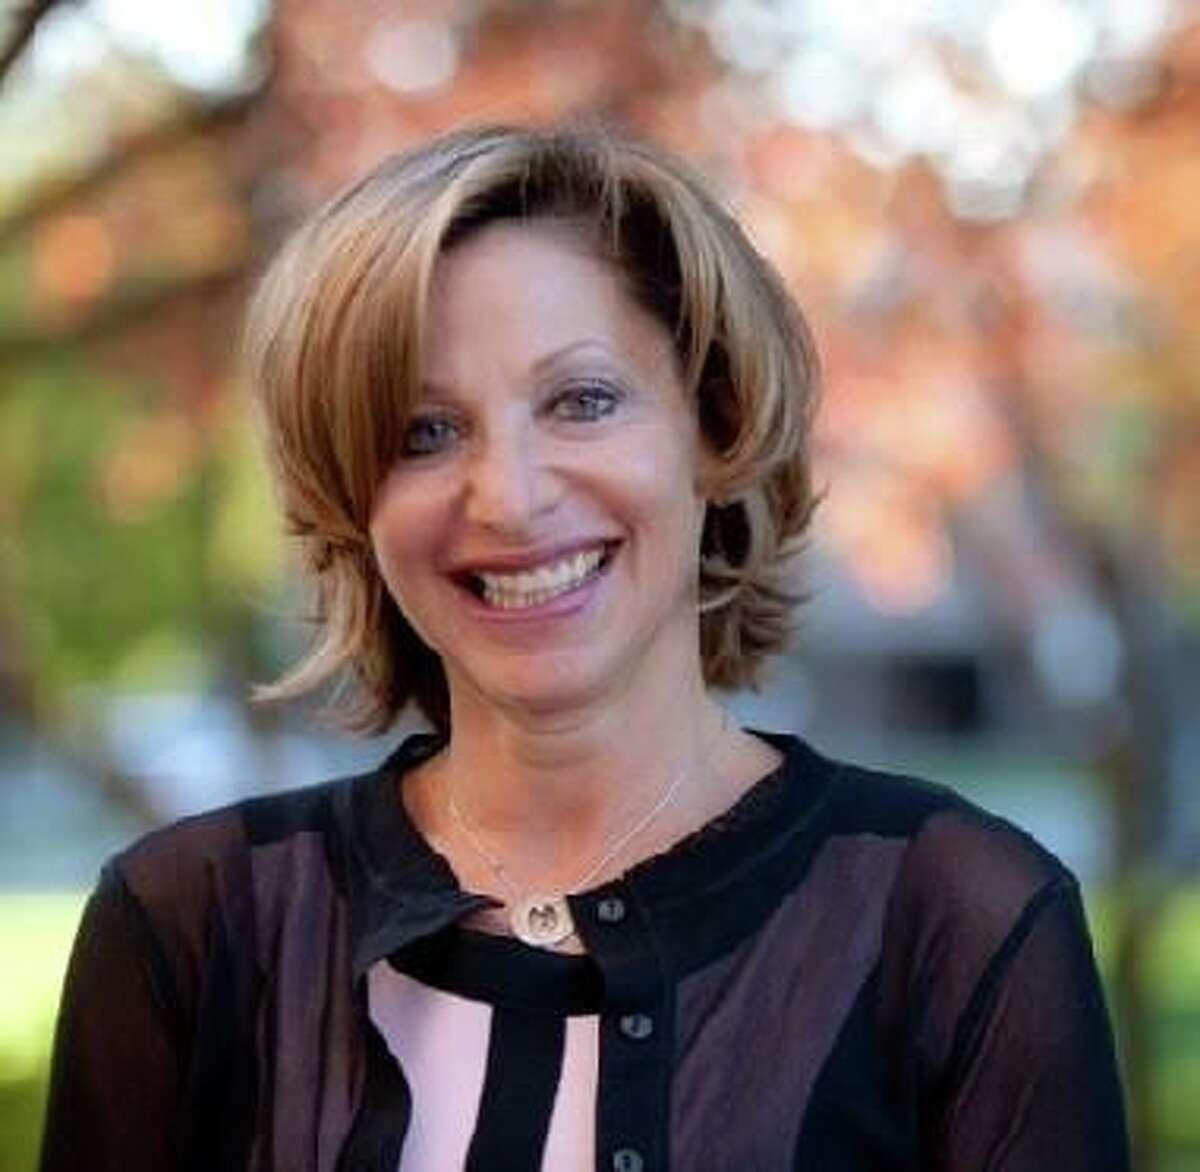 West Hartford Mayor Shari Cantor